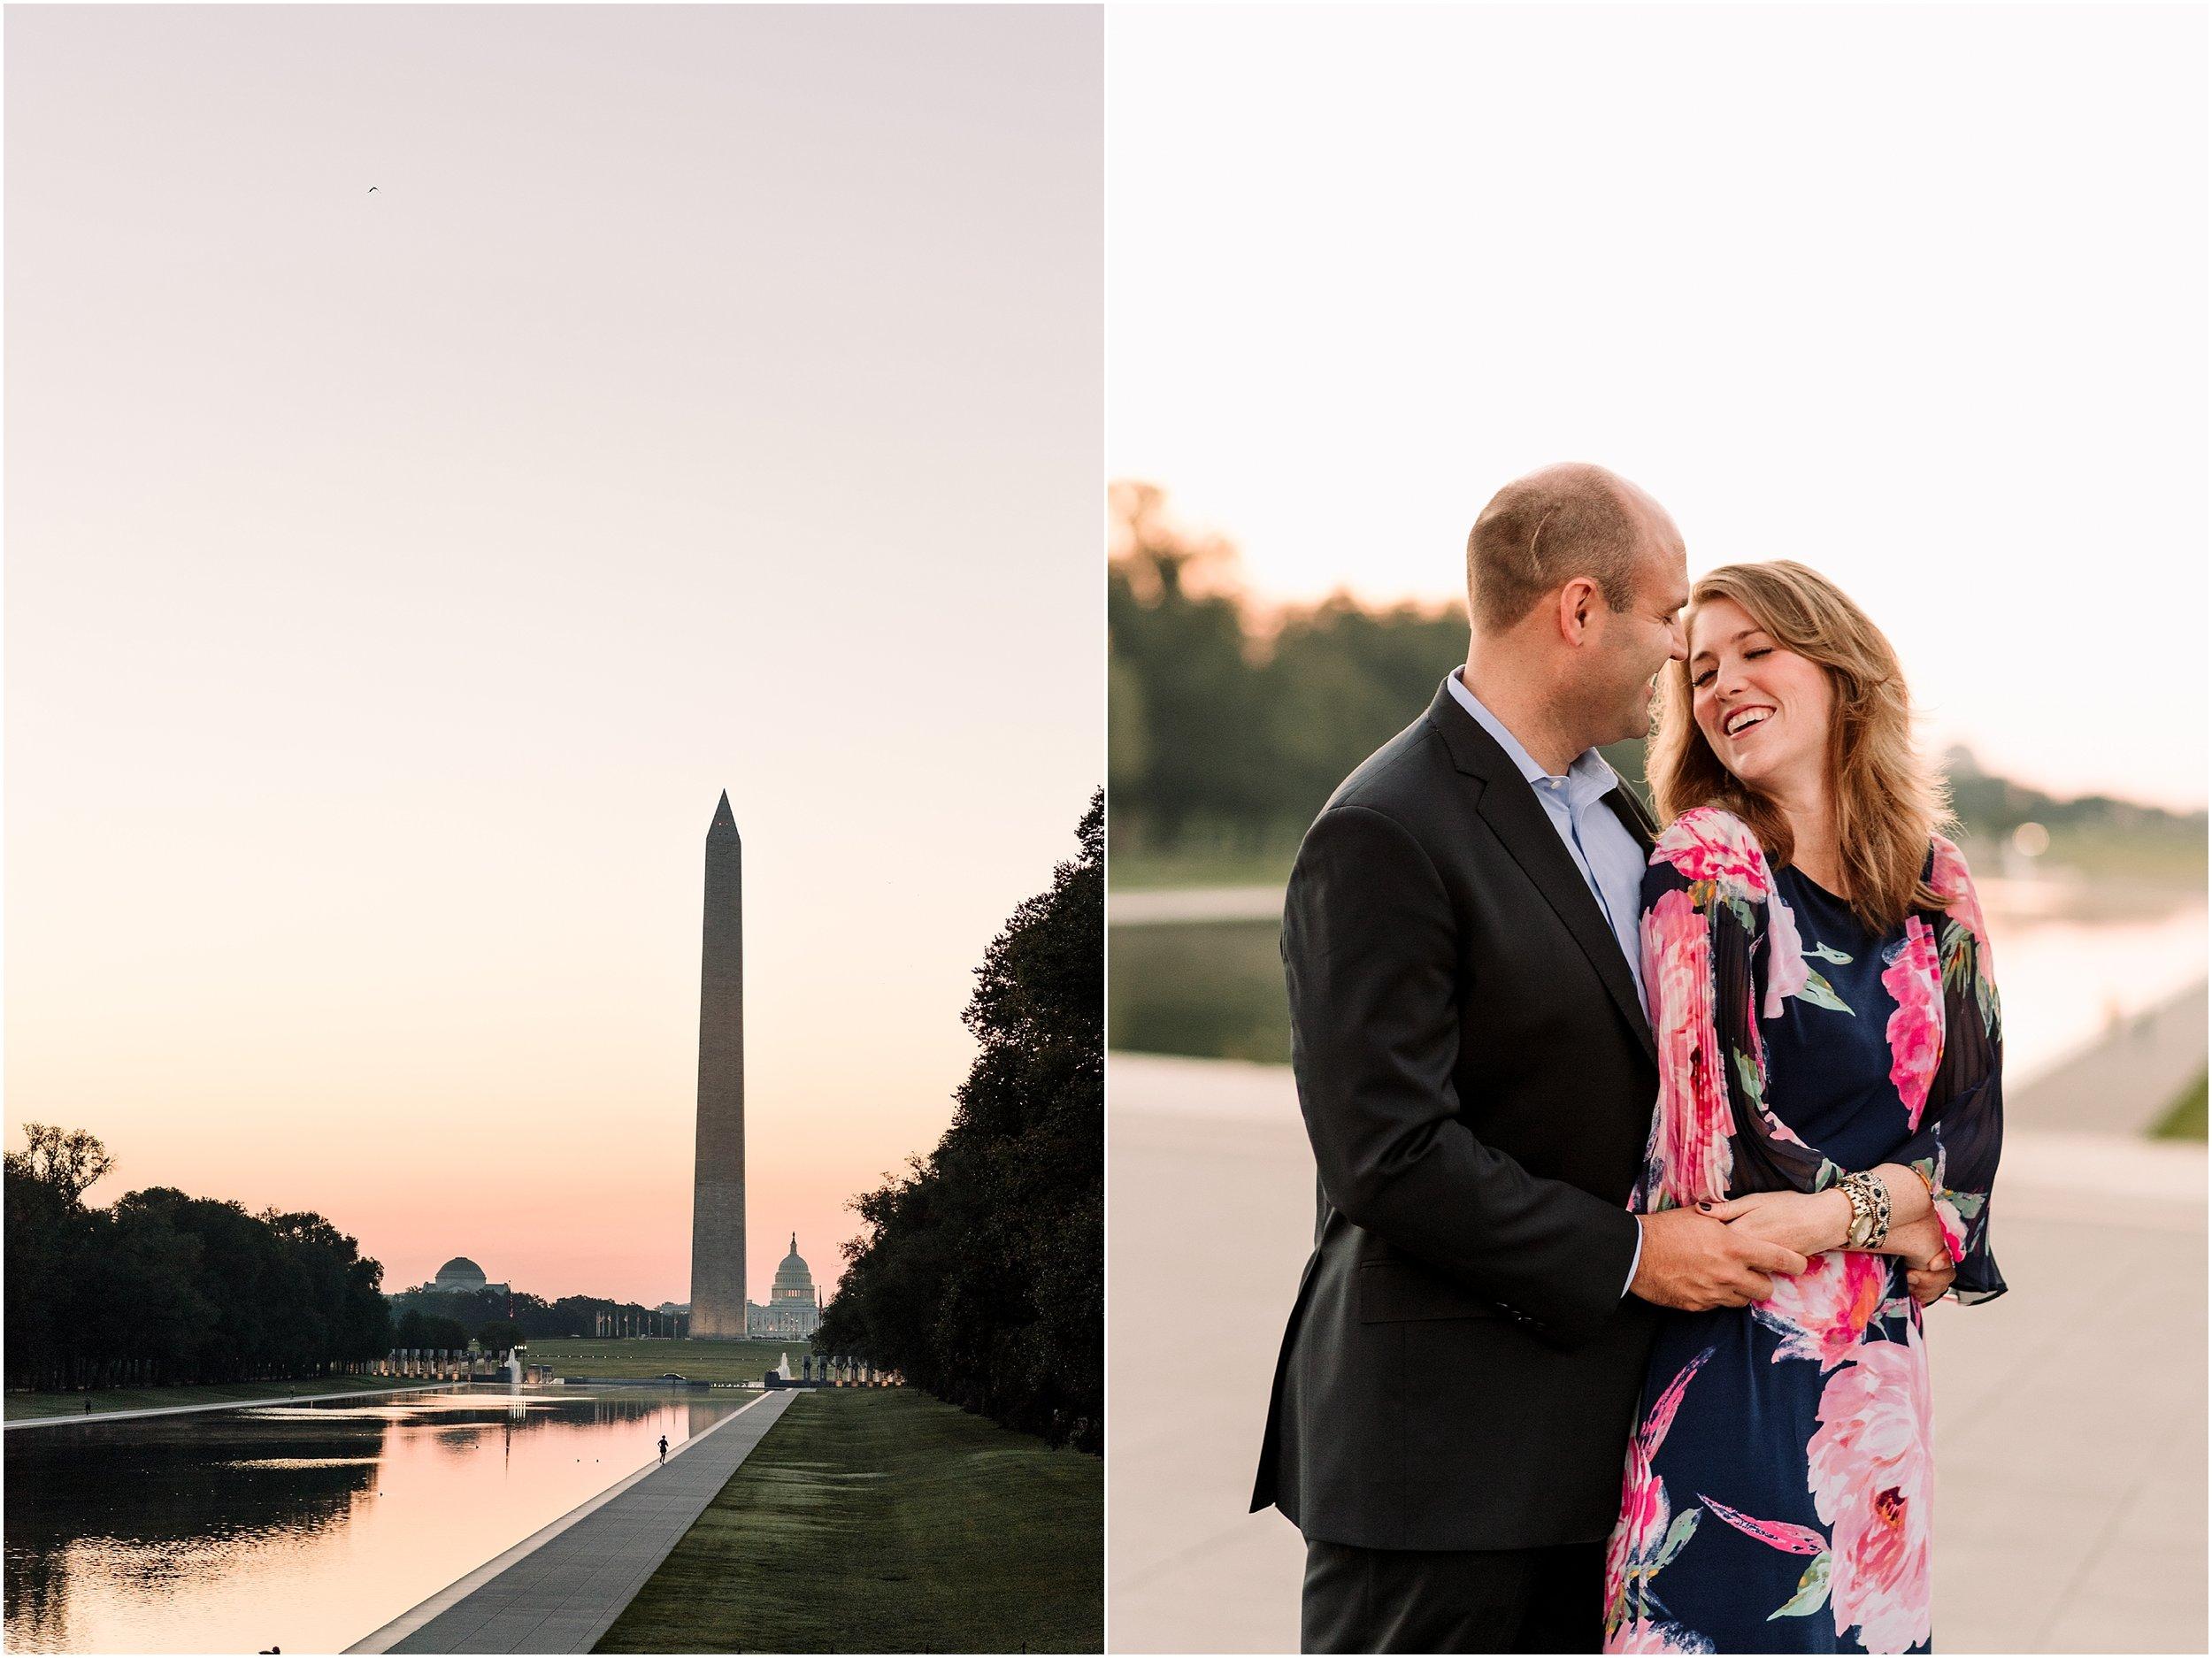 hannah leigh photography Sunrise Jefferson Memorial Engagement Session, Washington DC_1003.jpg